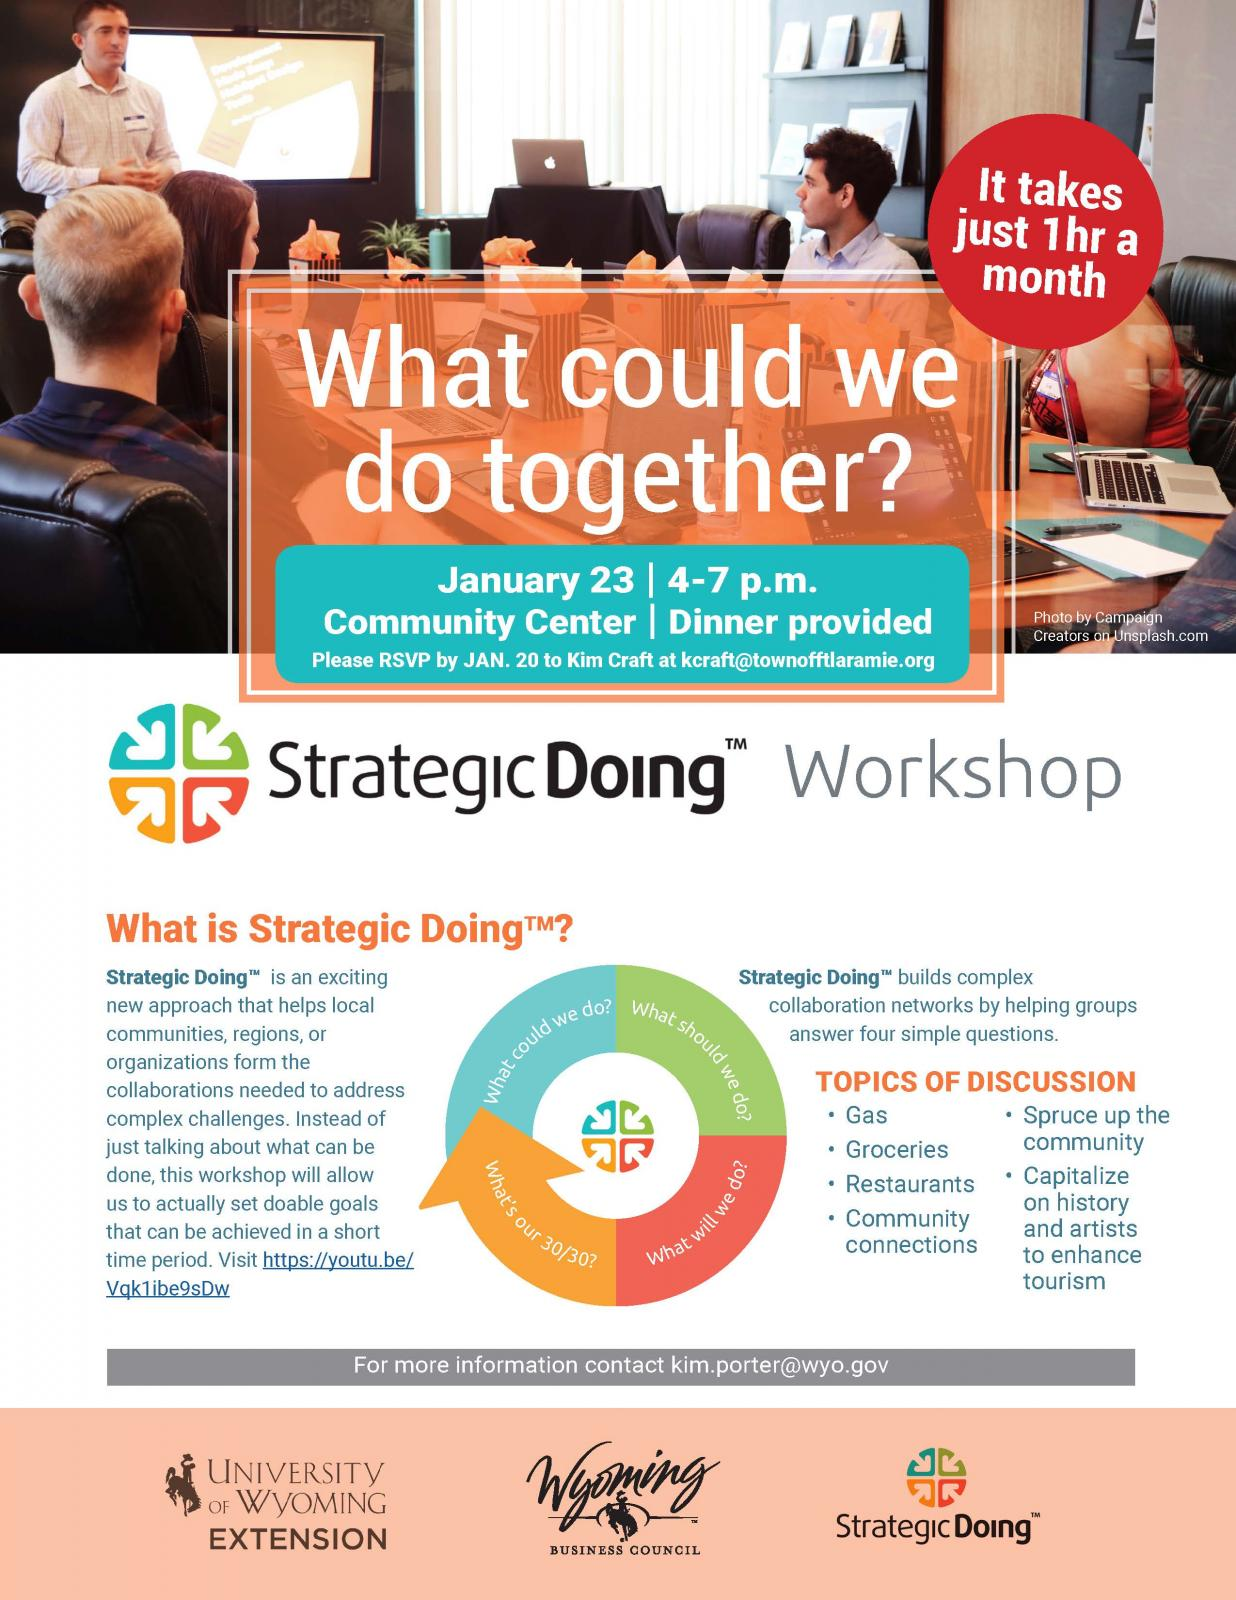 Strategic Doing Workshop for Ft. Laramie Photo